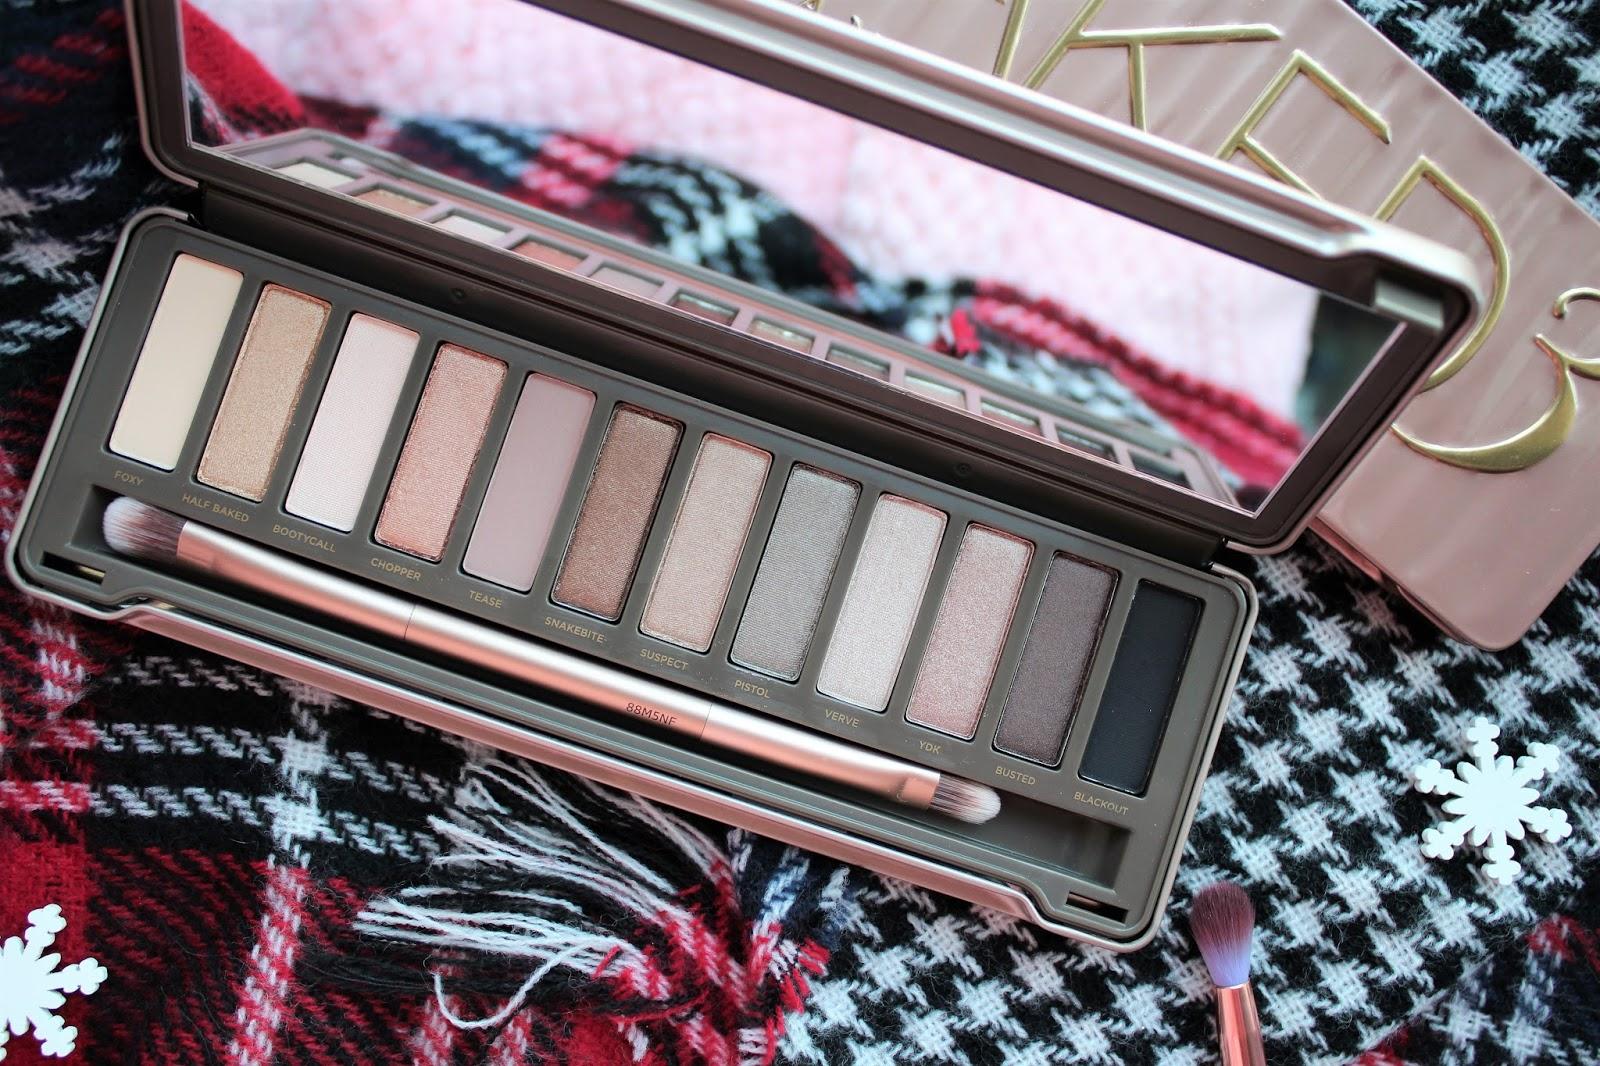 naked palettes comparison